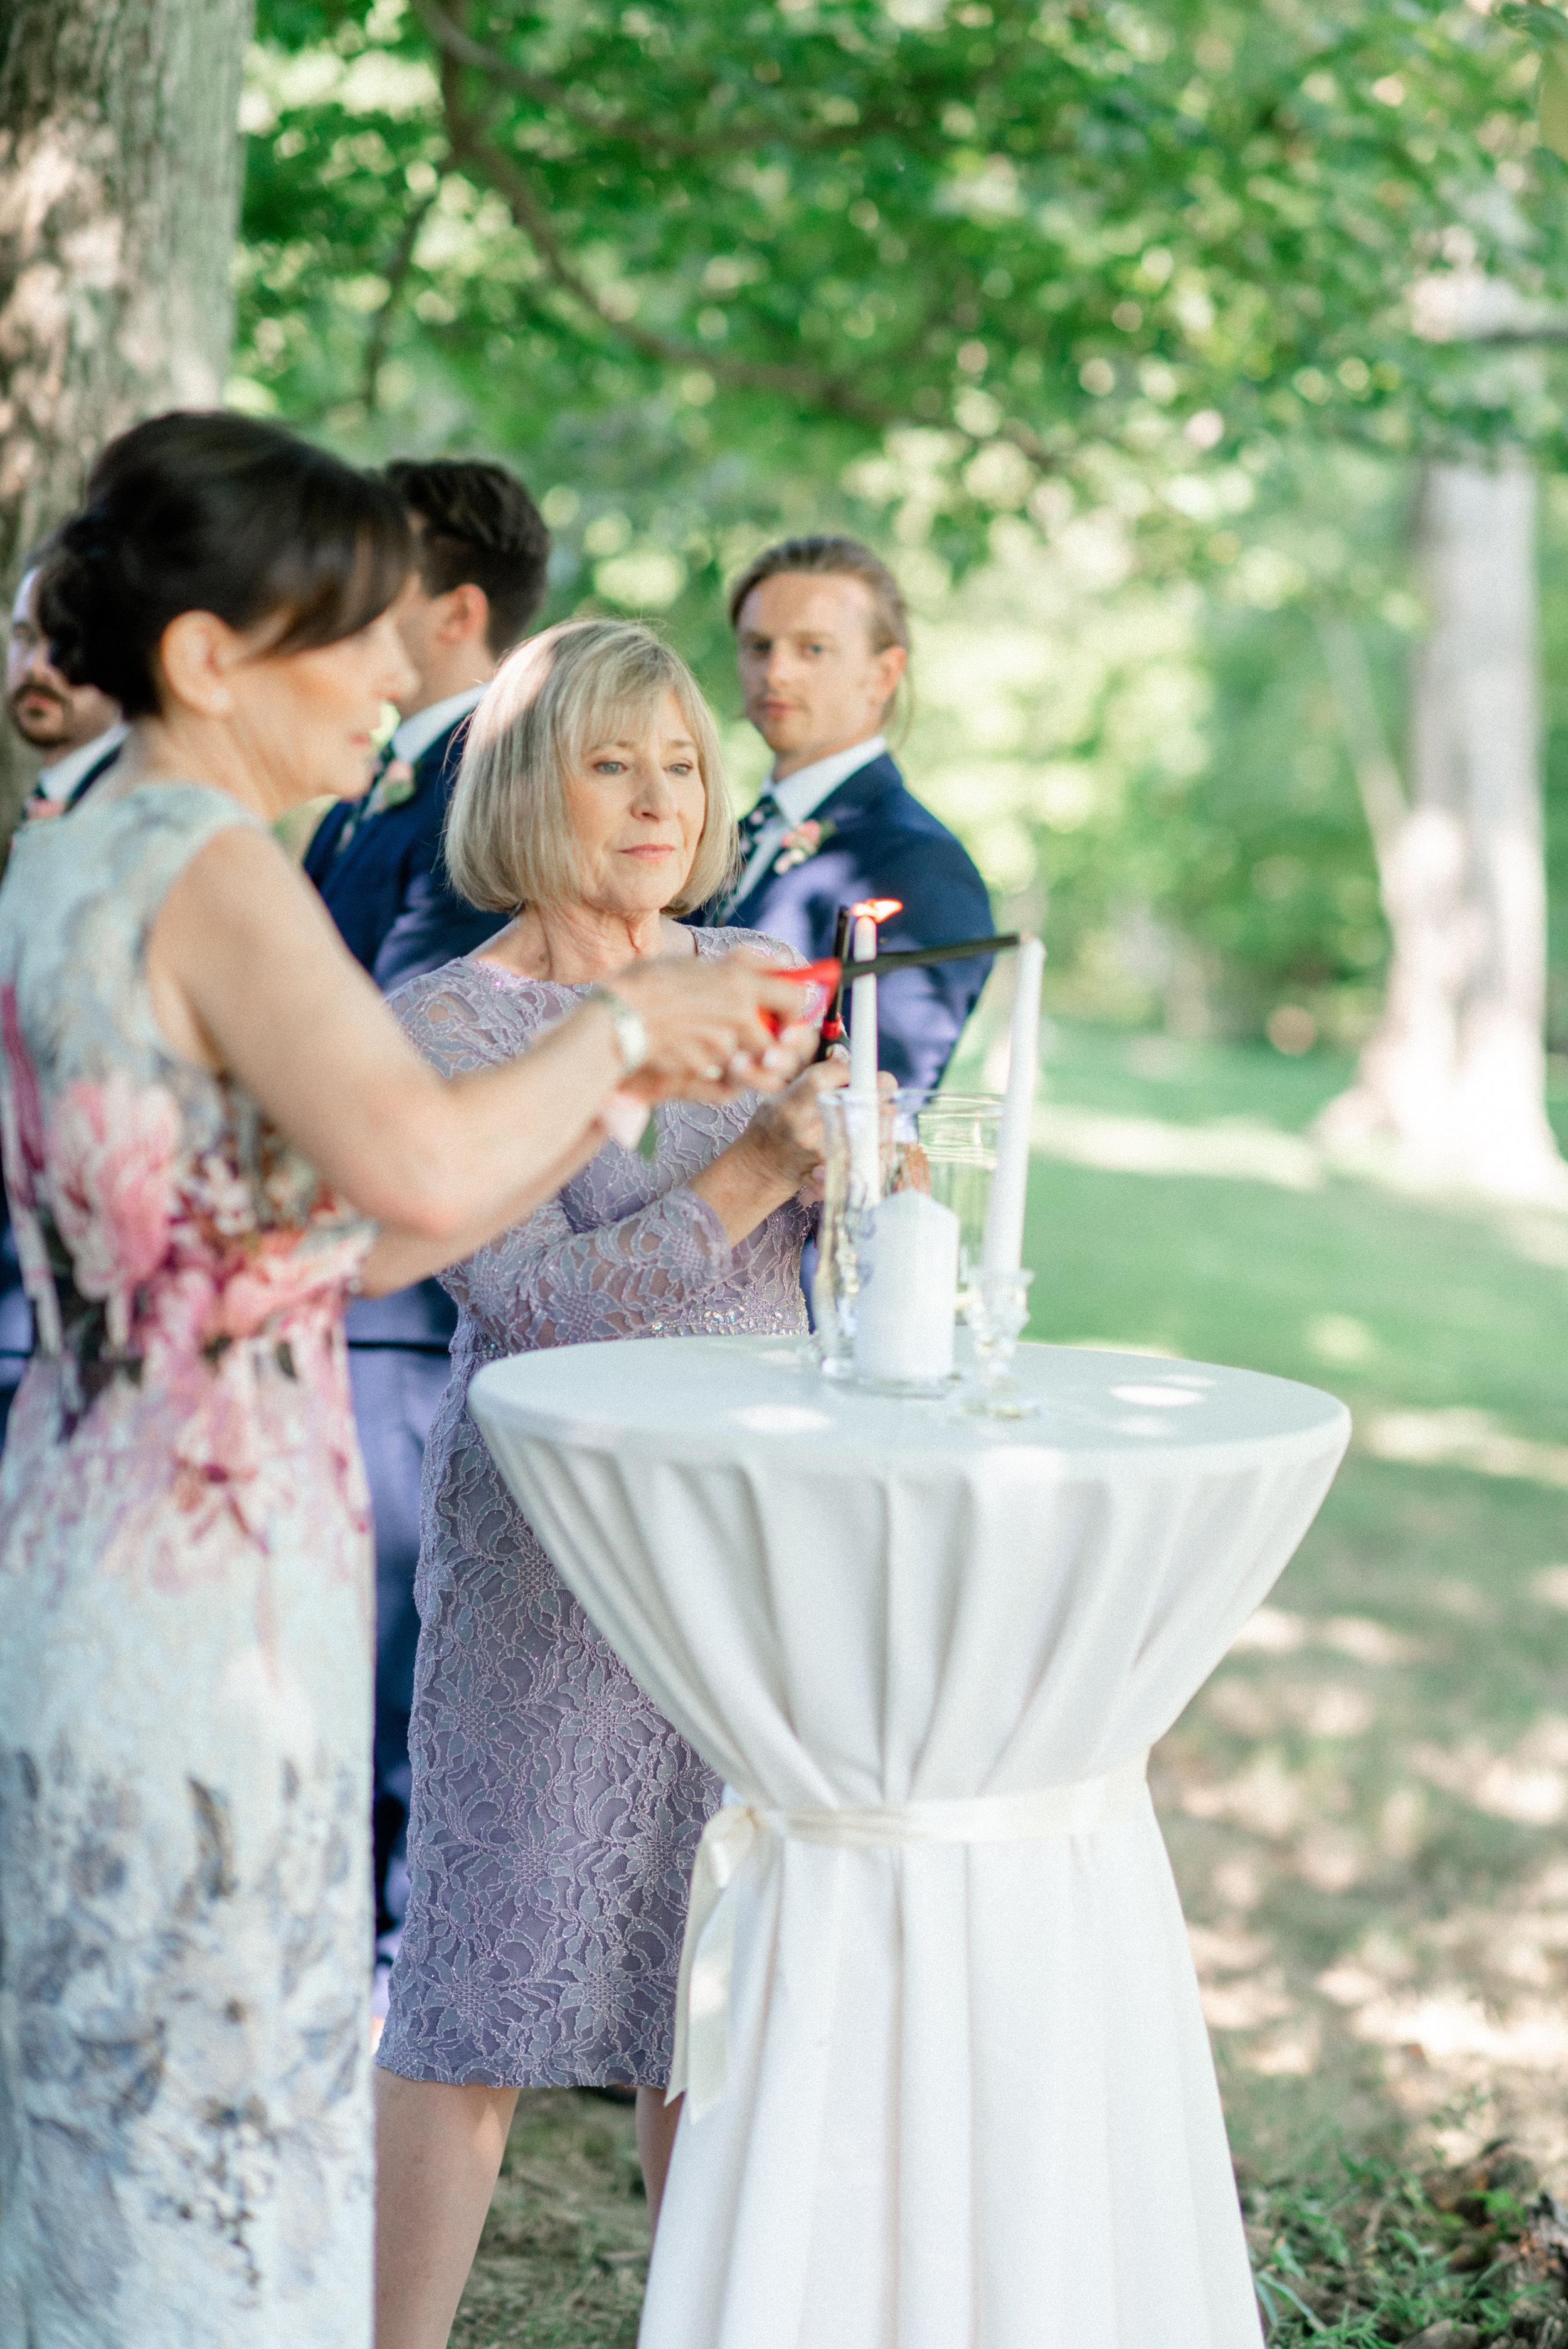 Ceremony-Anna+Dan_(80_of_115).jpg